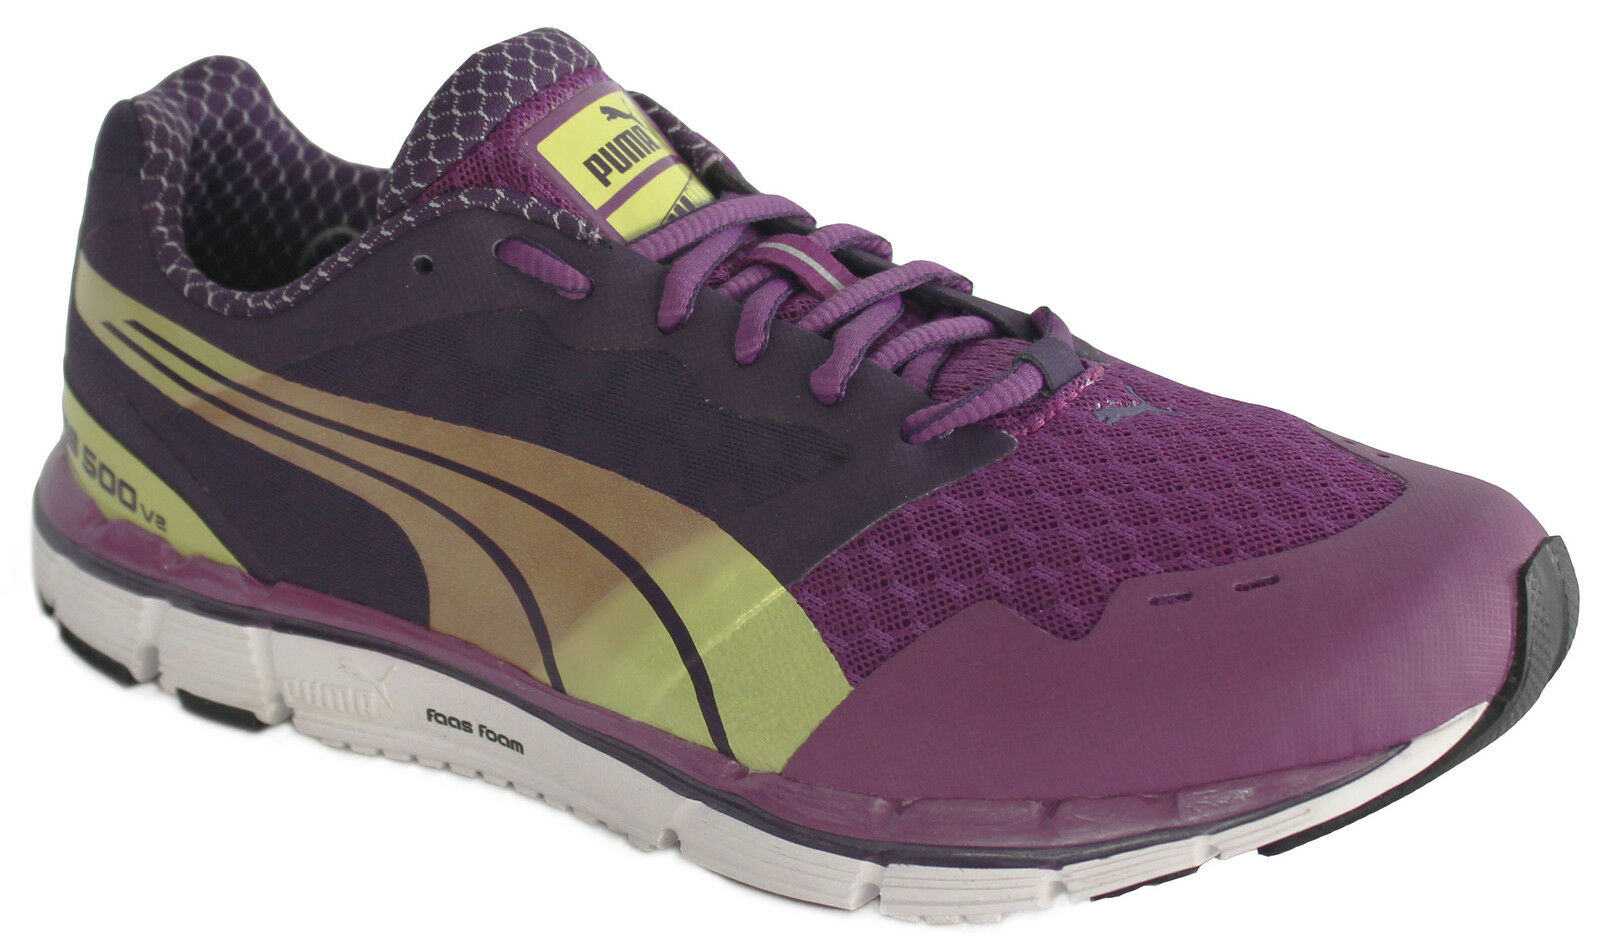 Puma Faas 500 V2 Womens Girls Mesh Lace Up Running Shoes 186489 09 D49